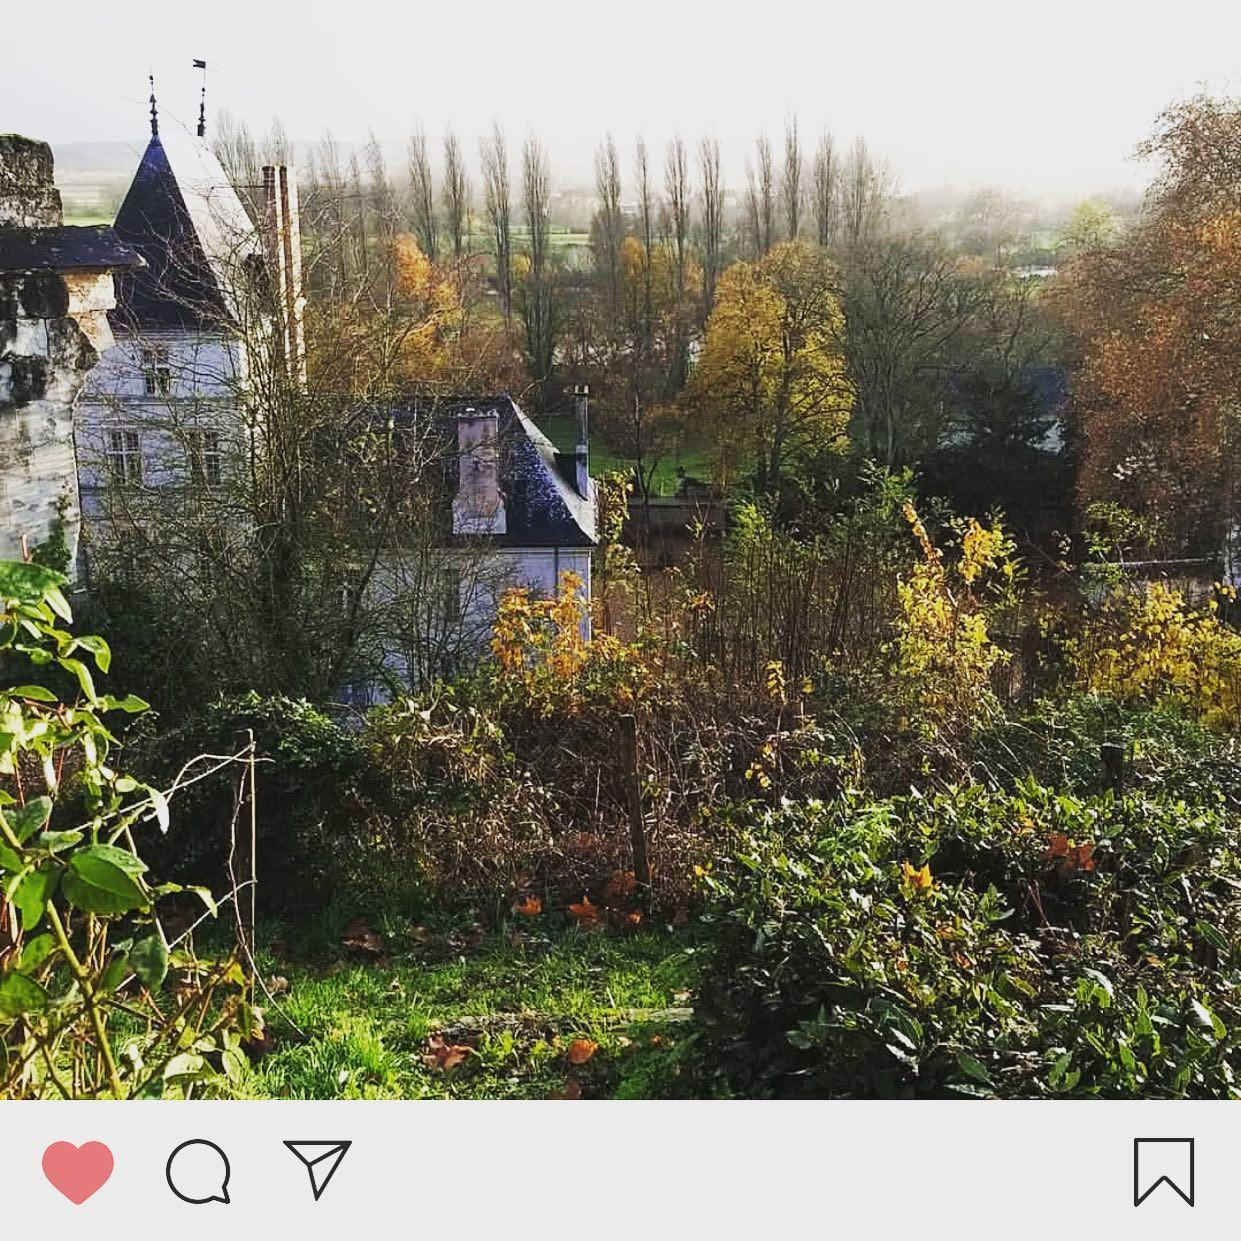 Instagram #valleeduloir